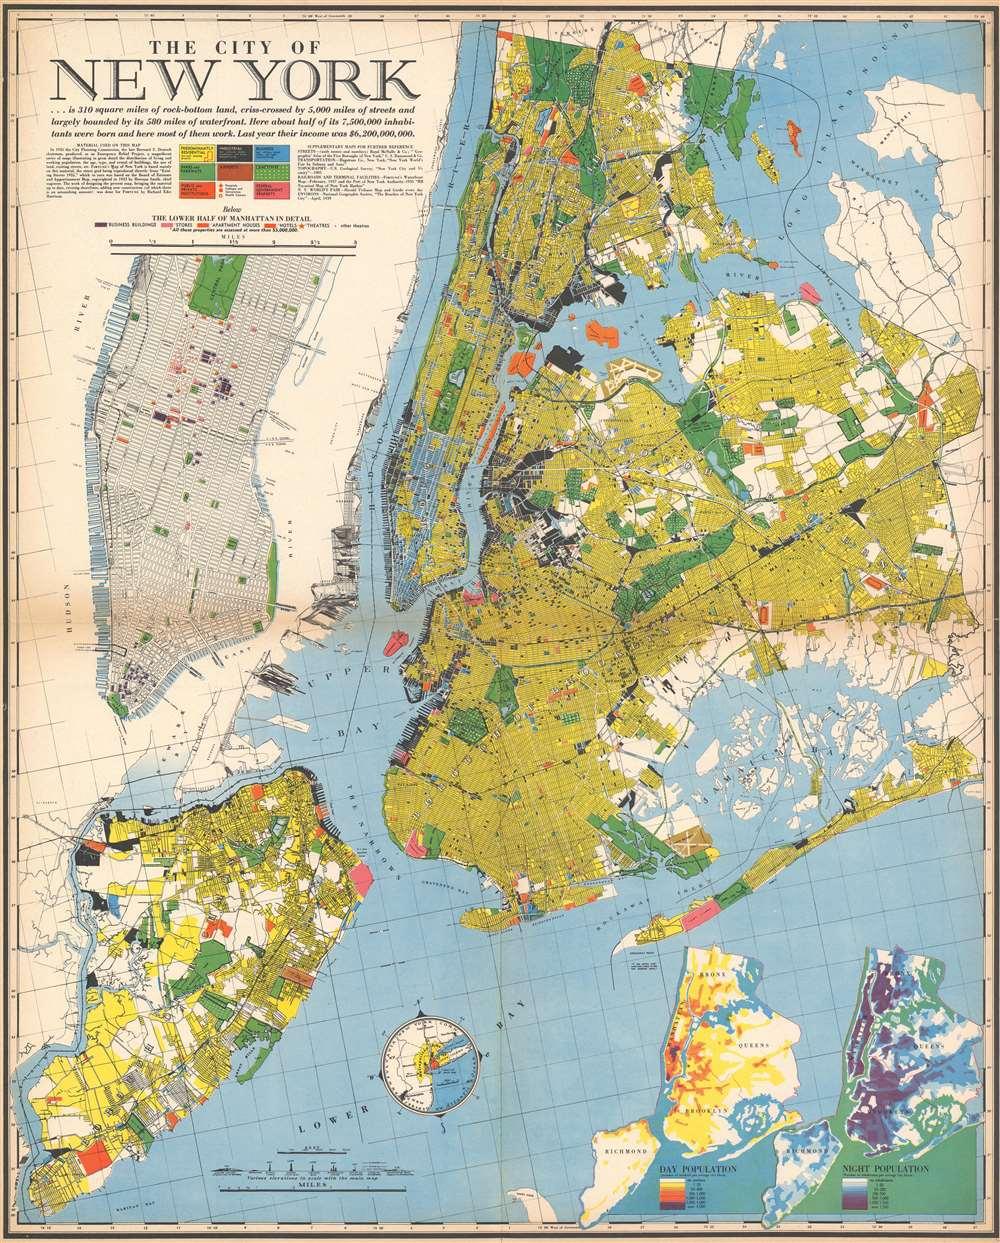 1939 Richard Edes Harrison Map of New York City